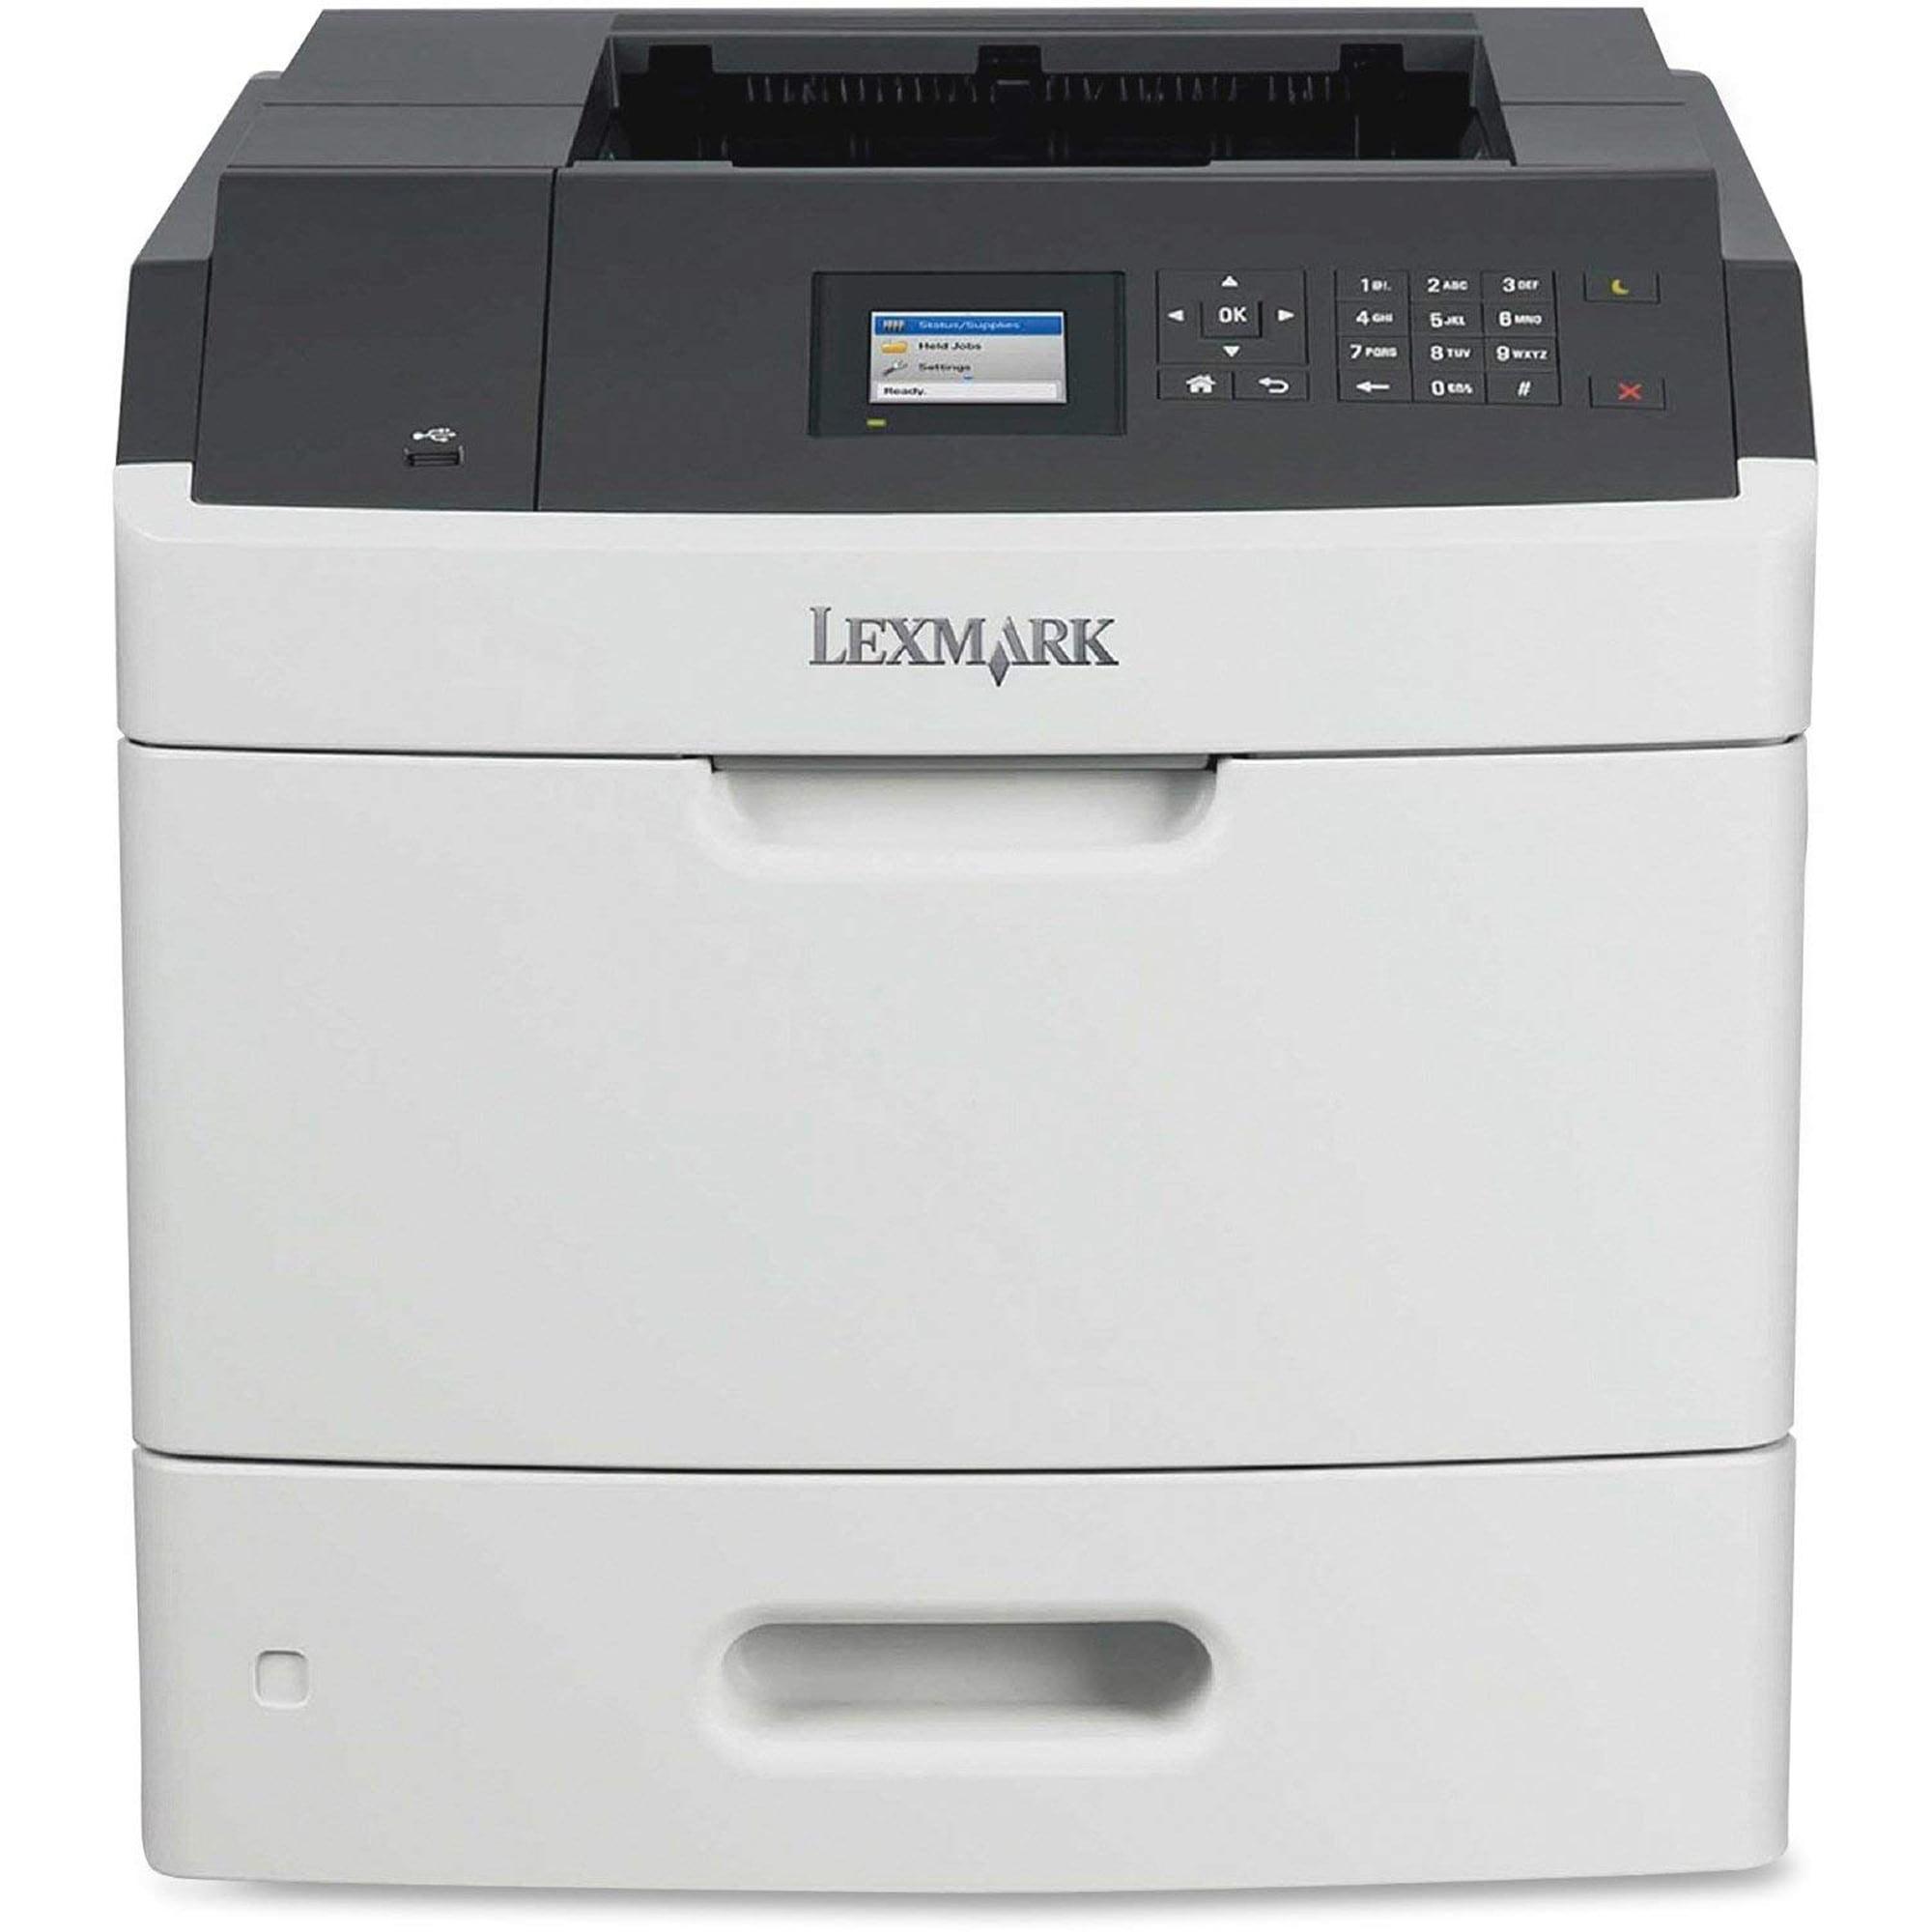 Lexmark 40G0100 MS810n Monochrome Laser Printer